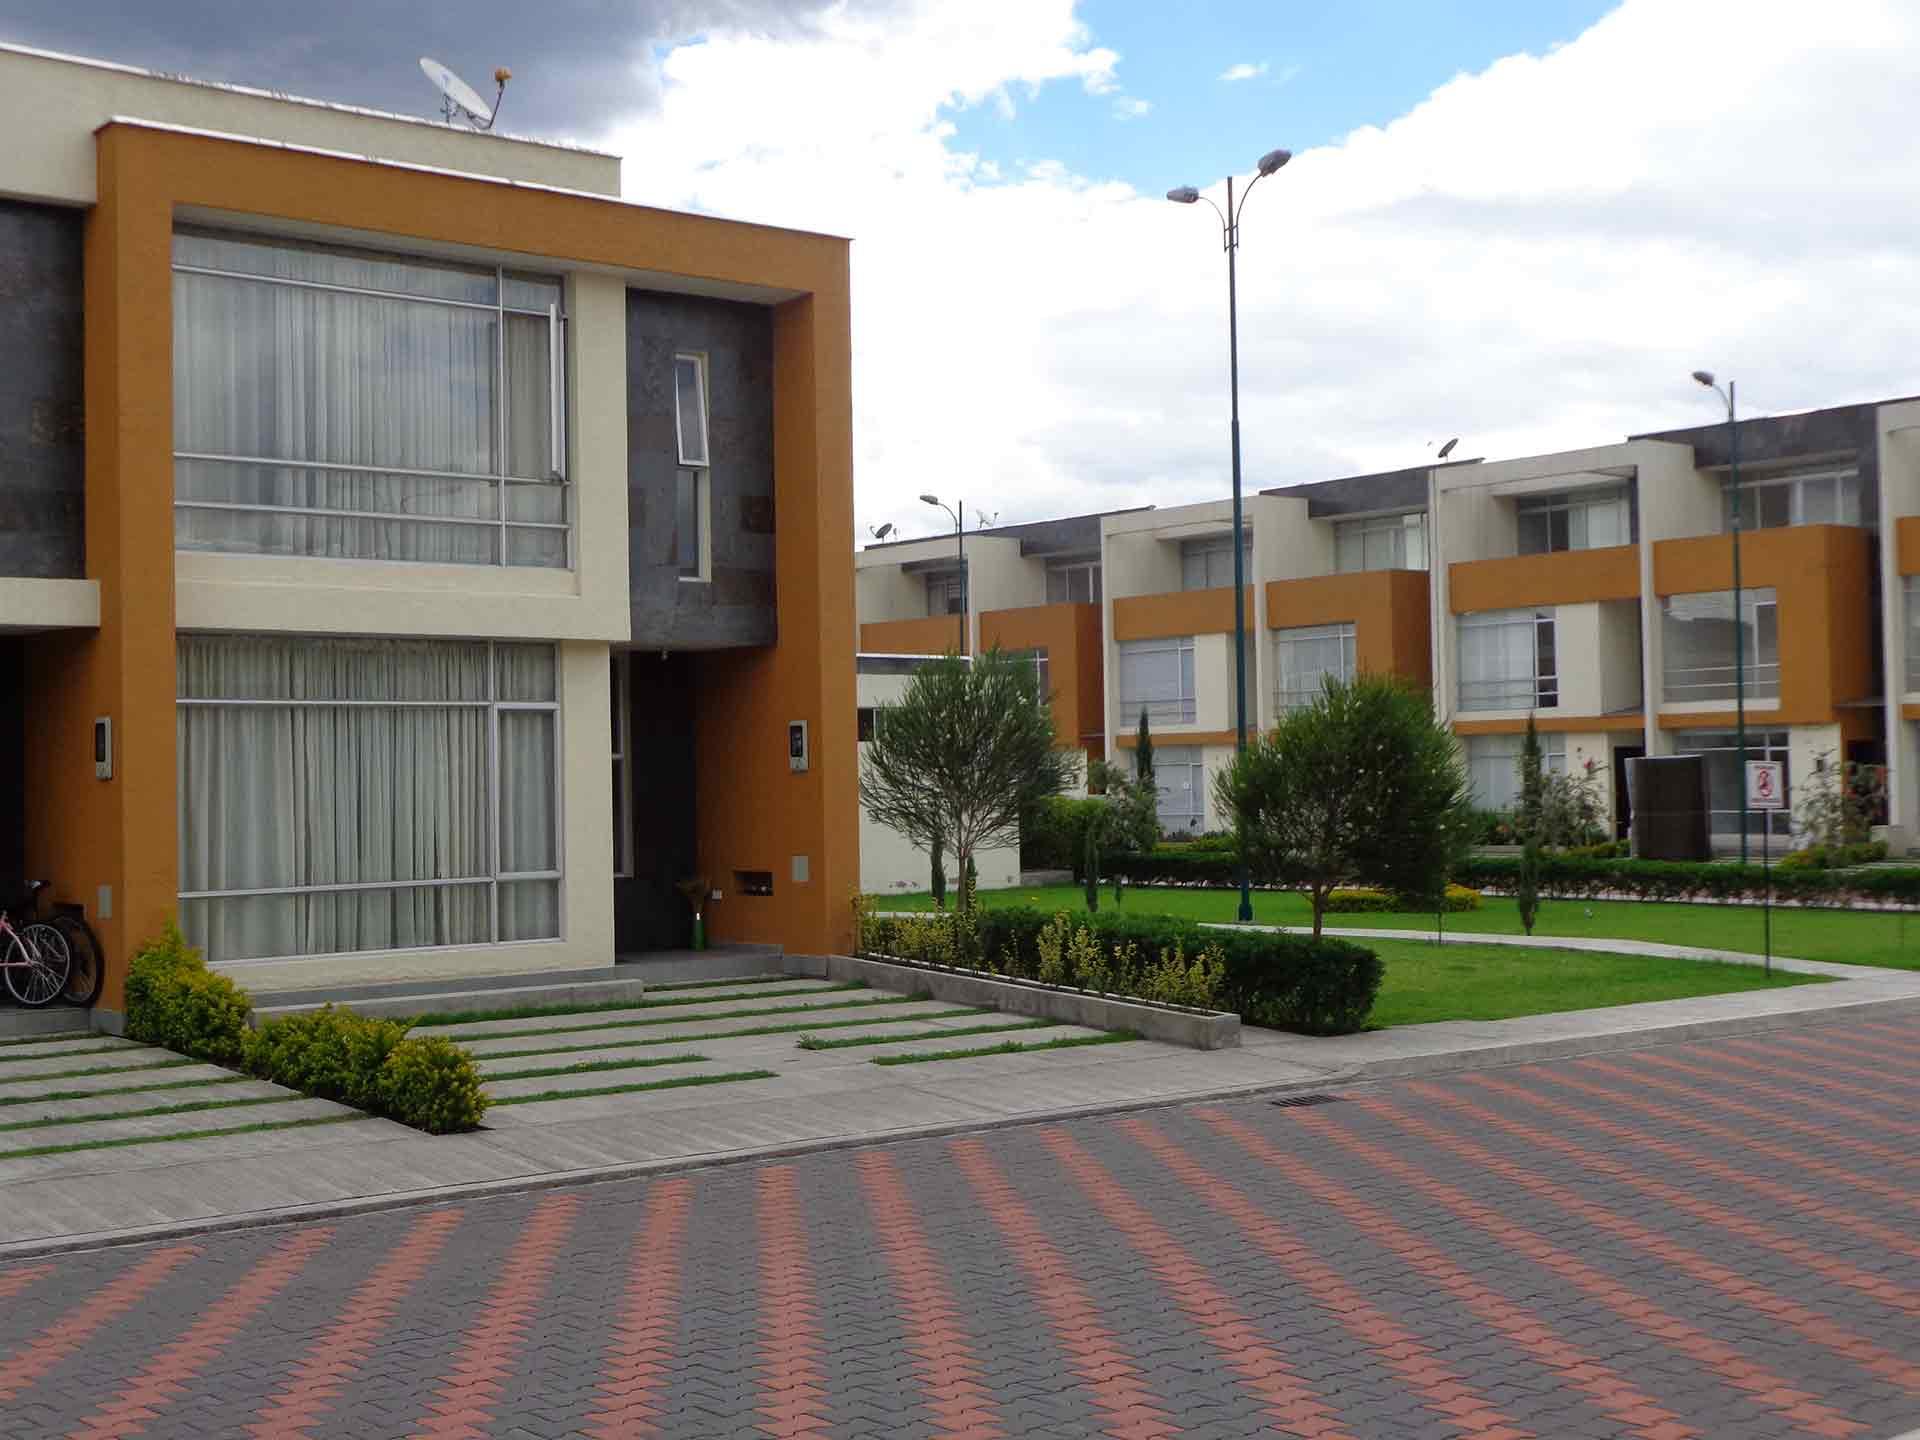 Panorama Gardens – casa 2 plantas de 120 m² – hermosas casas conjunto privado sector Capelo